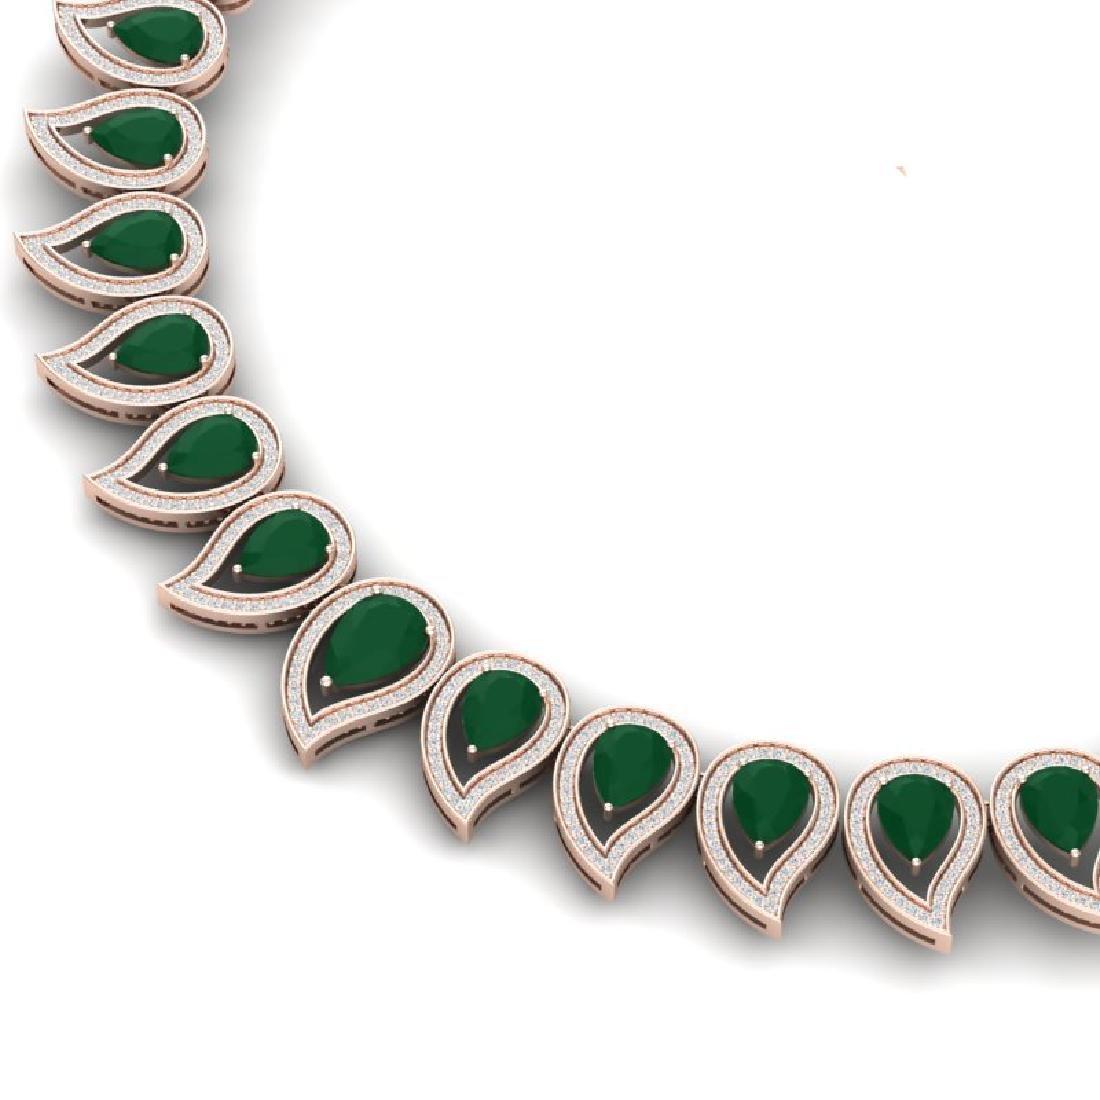 33.4 CTW Royalty Emerald & VS Diamond Necklace 18K Rose - 2